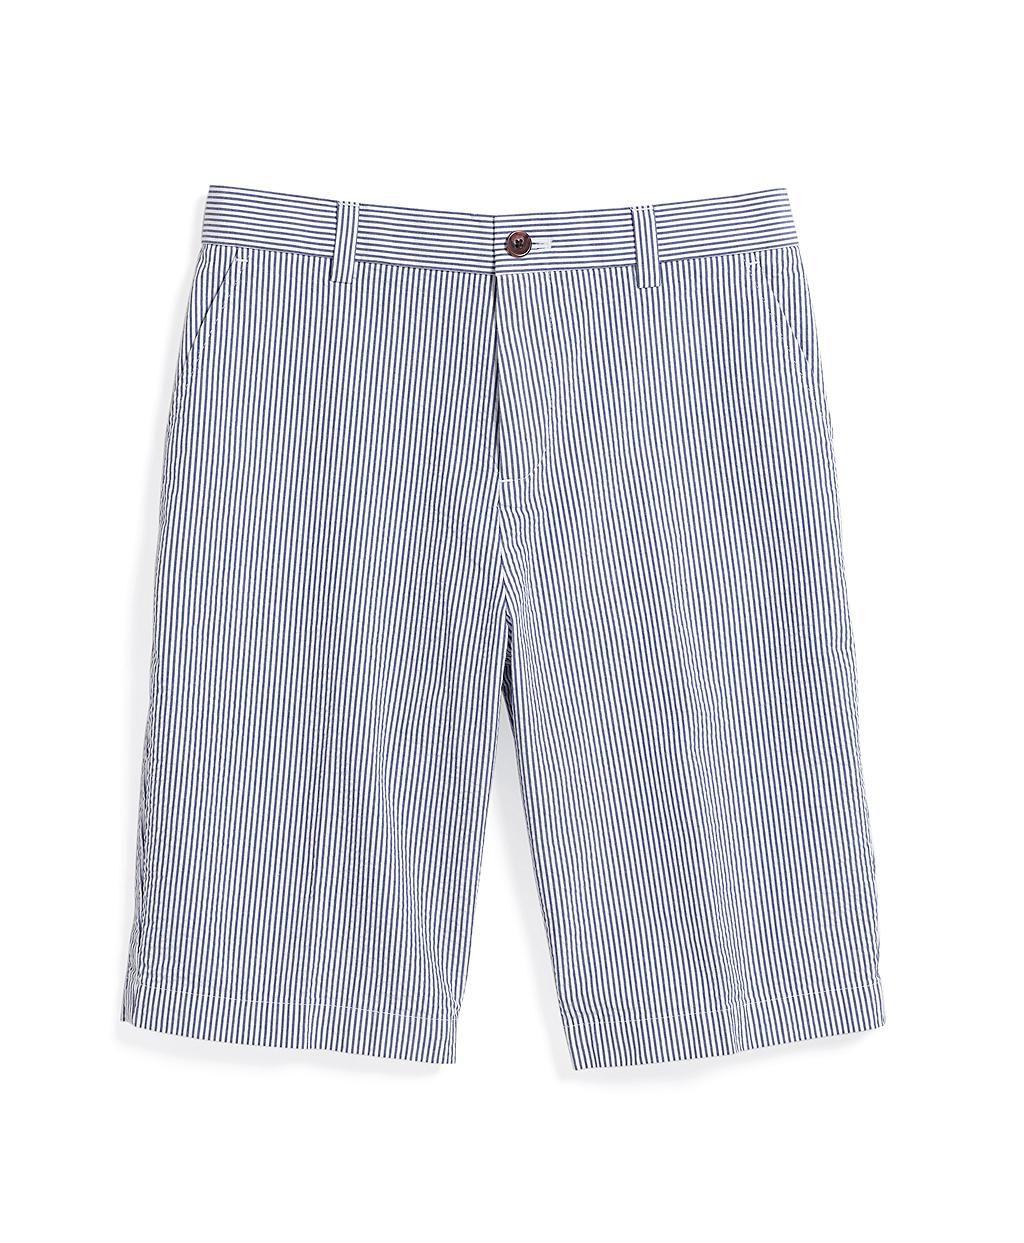 109cfdbbf3 Plain-Front Seersucker Shorts | Brooks Brothers | Get personal ...